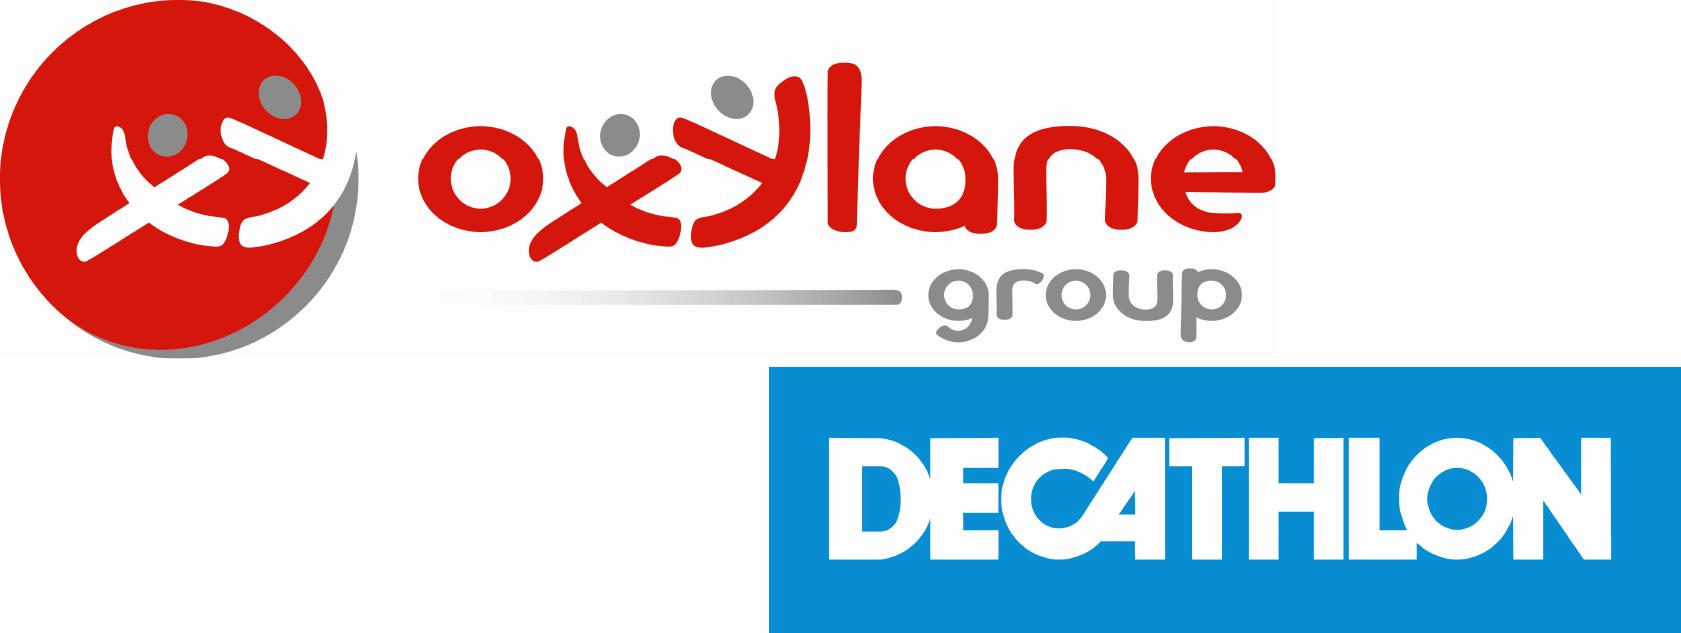 logo-oxylane-decathlon.jpg